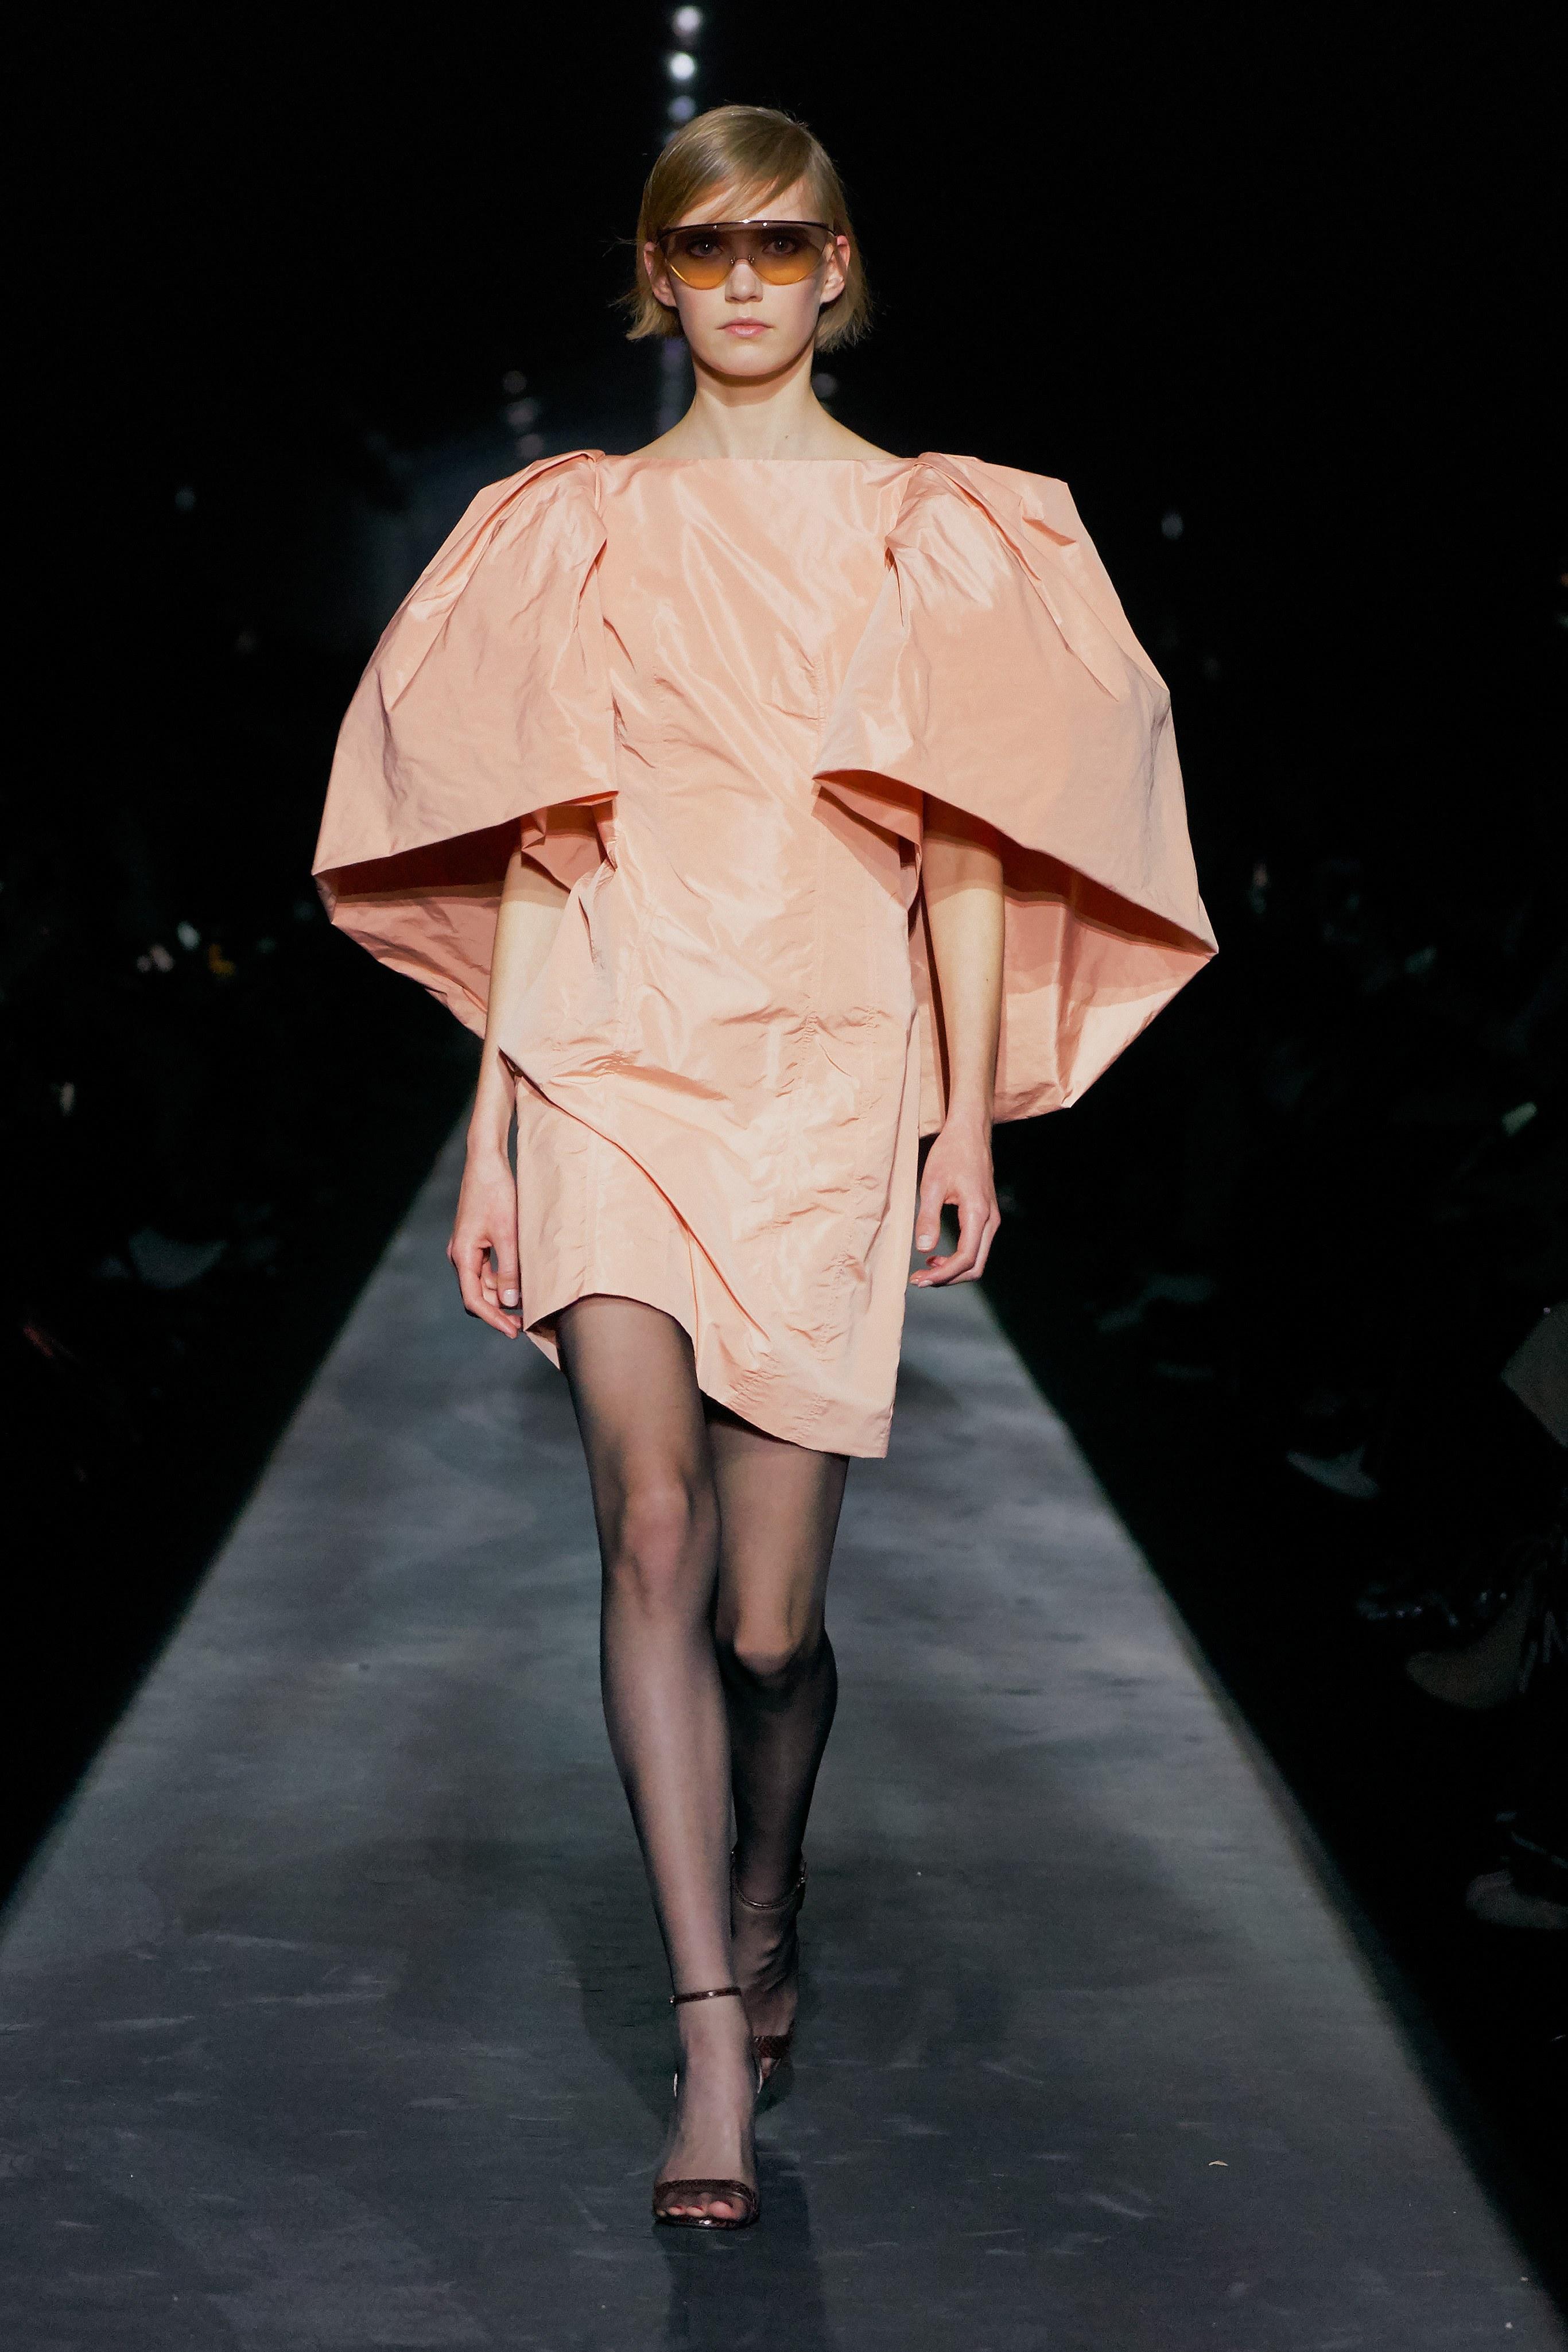 Ilya for Givenchy FW19